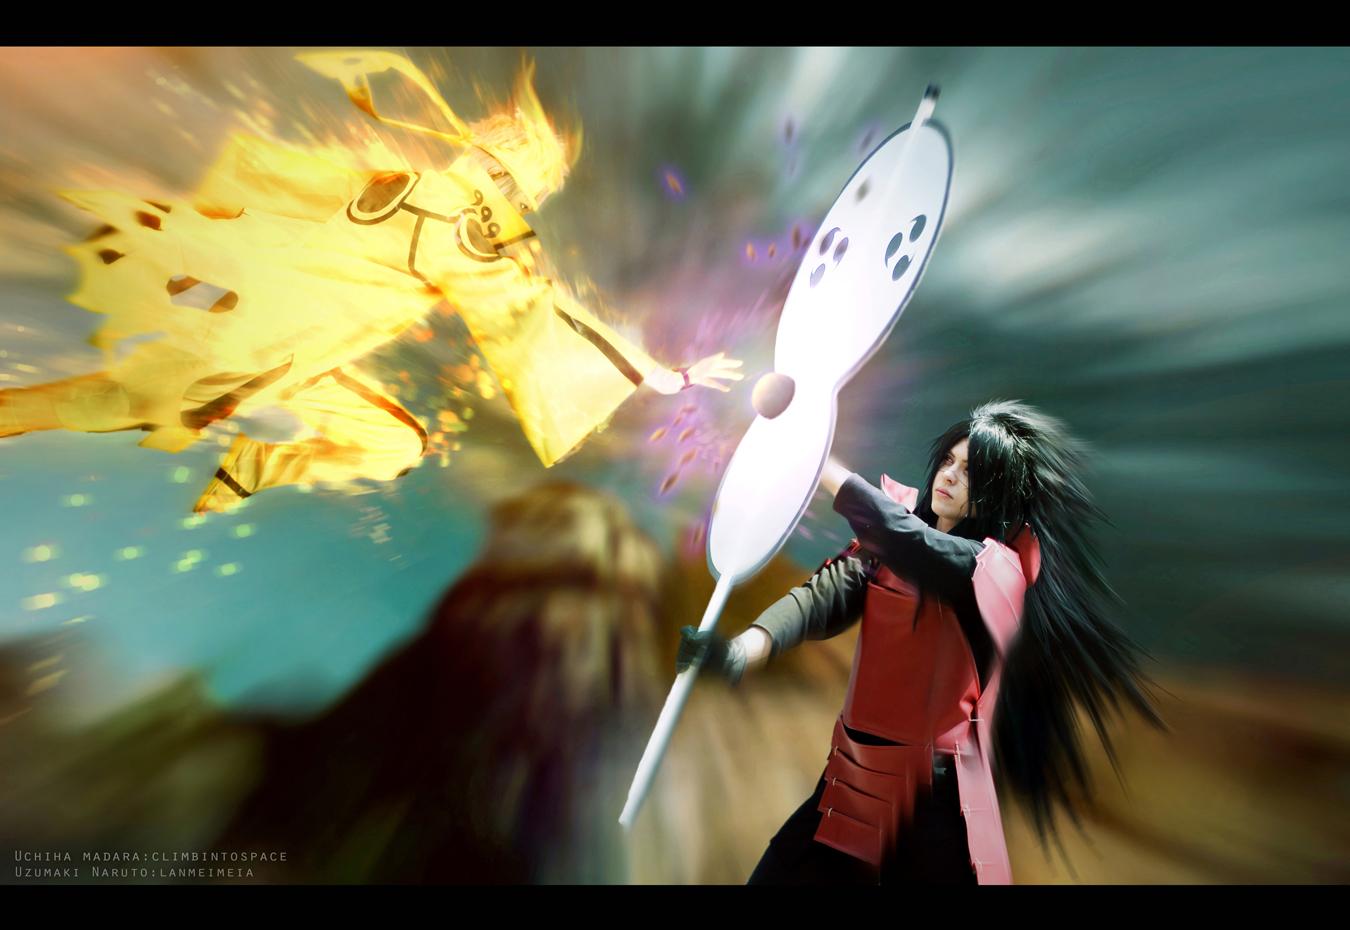 Naruto vs Madara by lanmeimeia